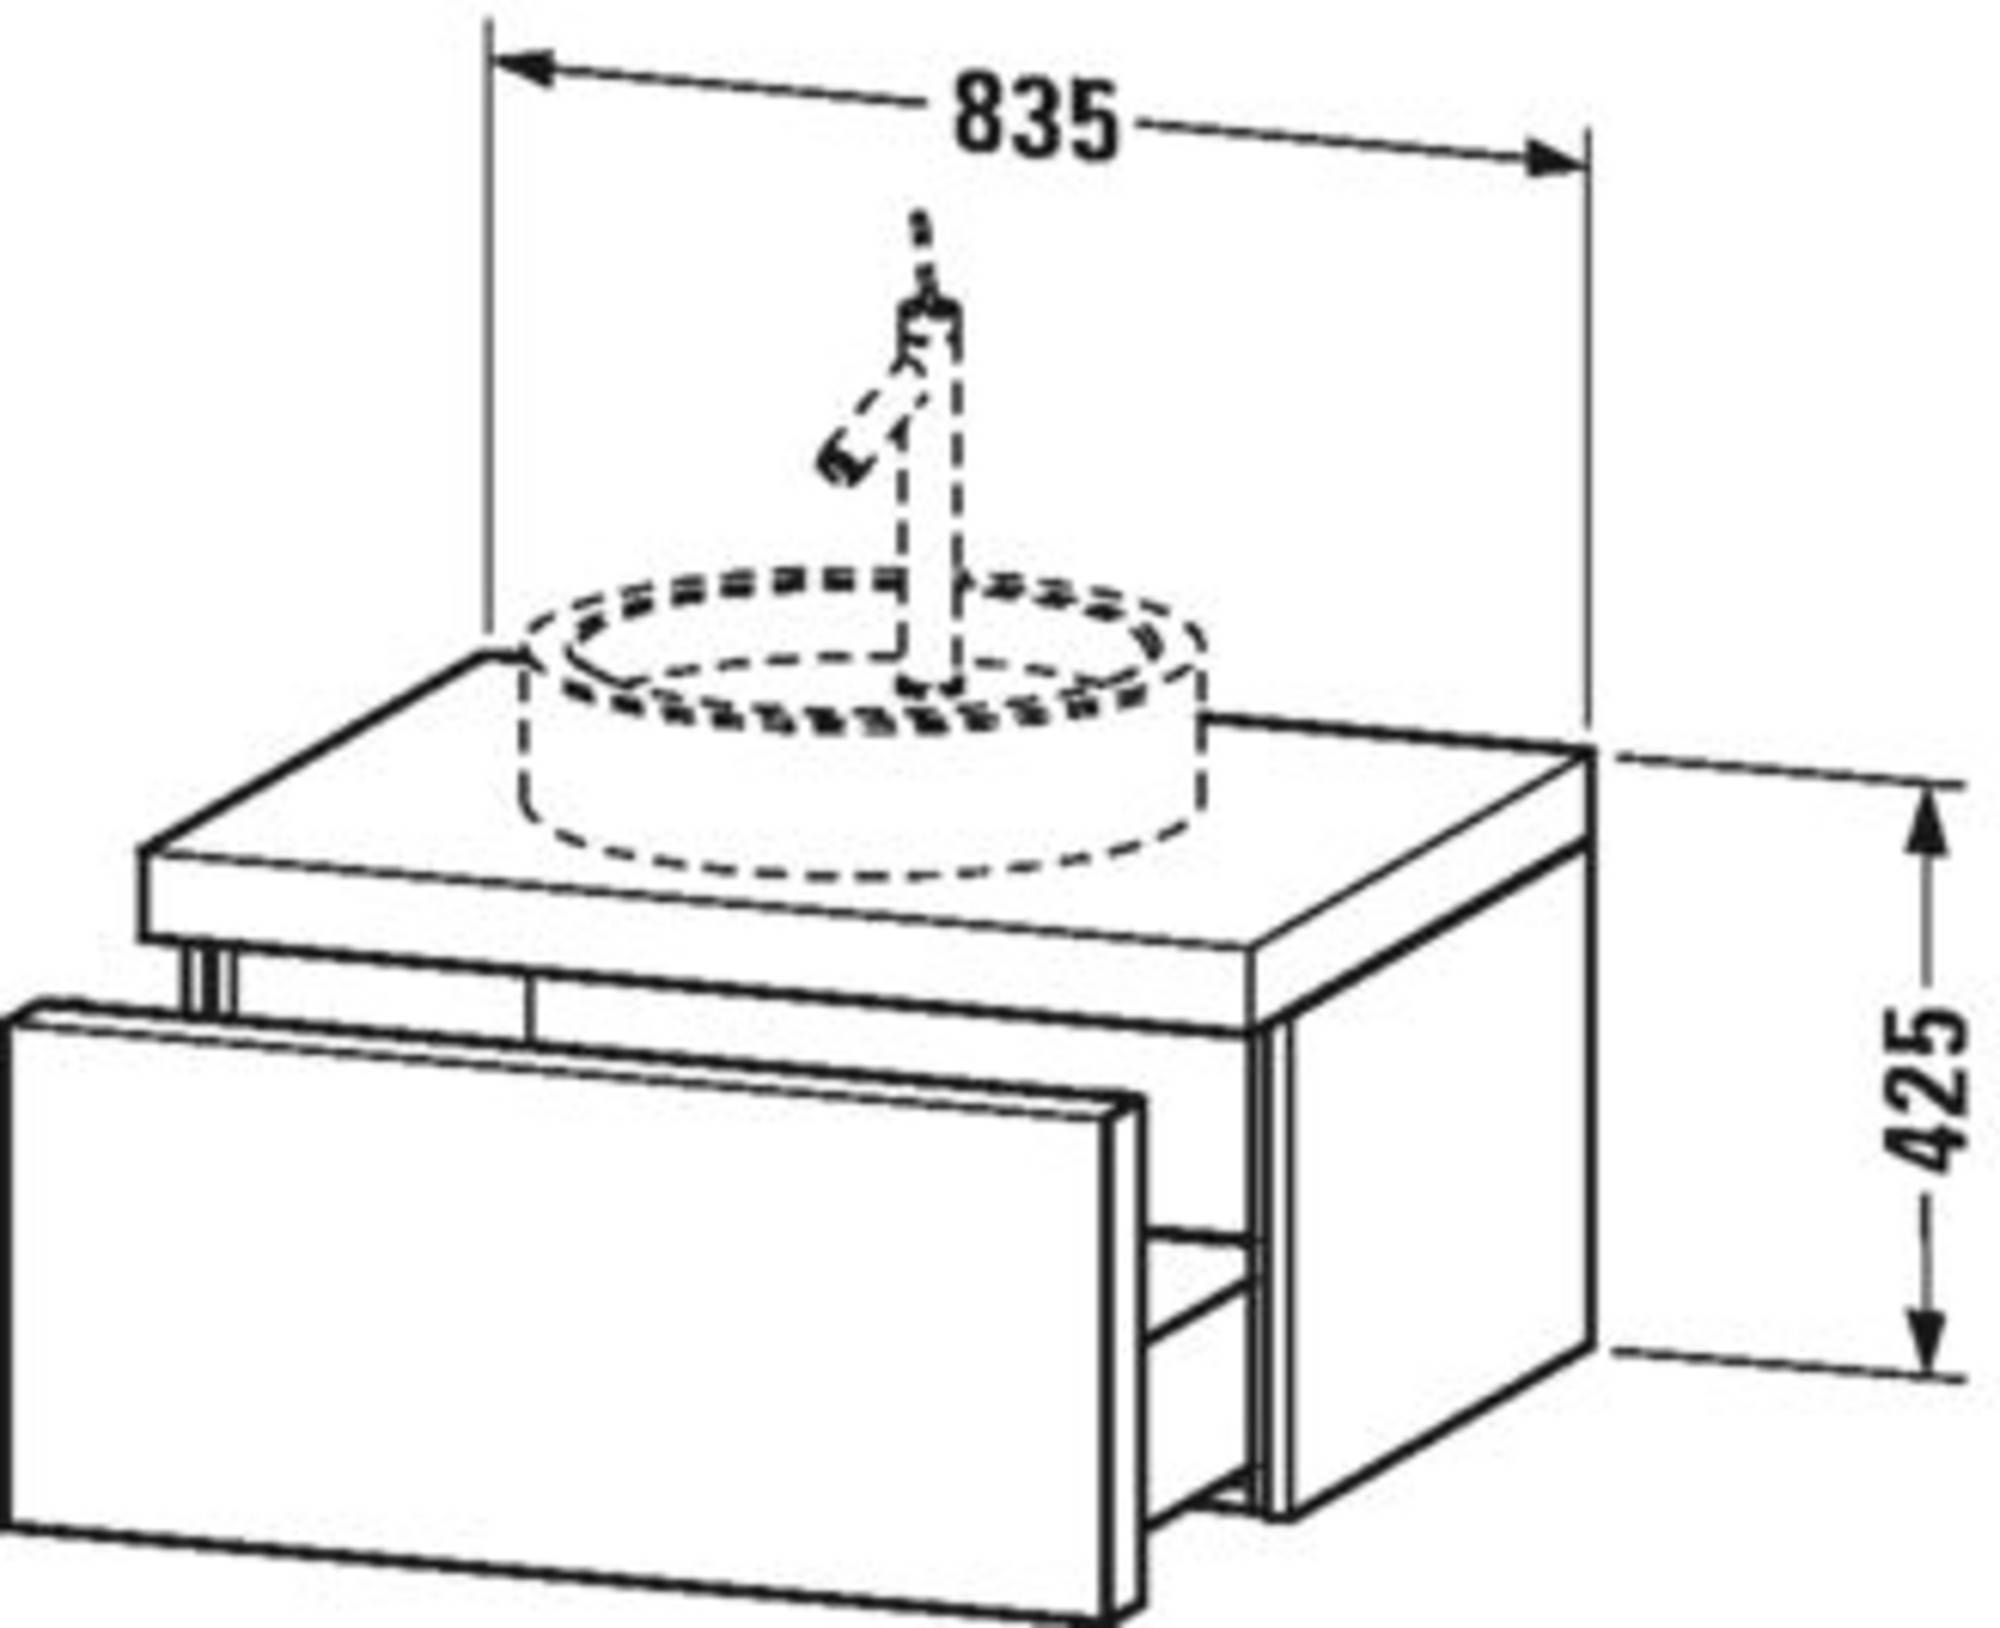 Duravit Starck I onderkast 1 lade  83,5x56,5x42,5 cm Amerikaans Noten